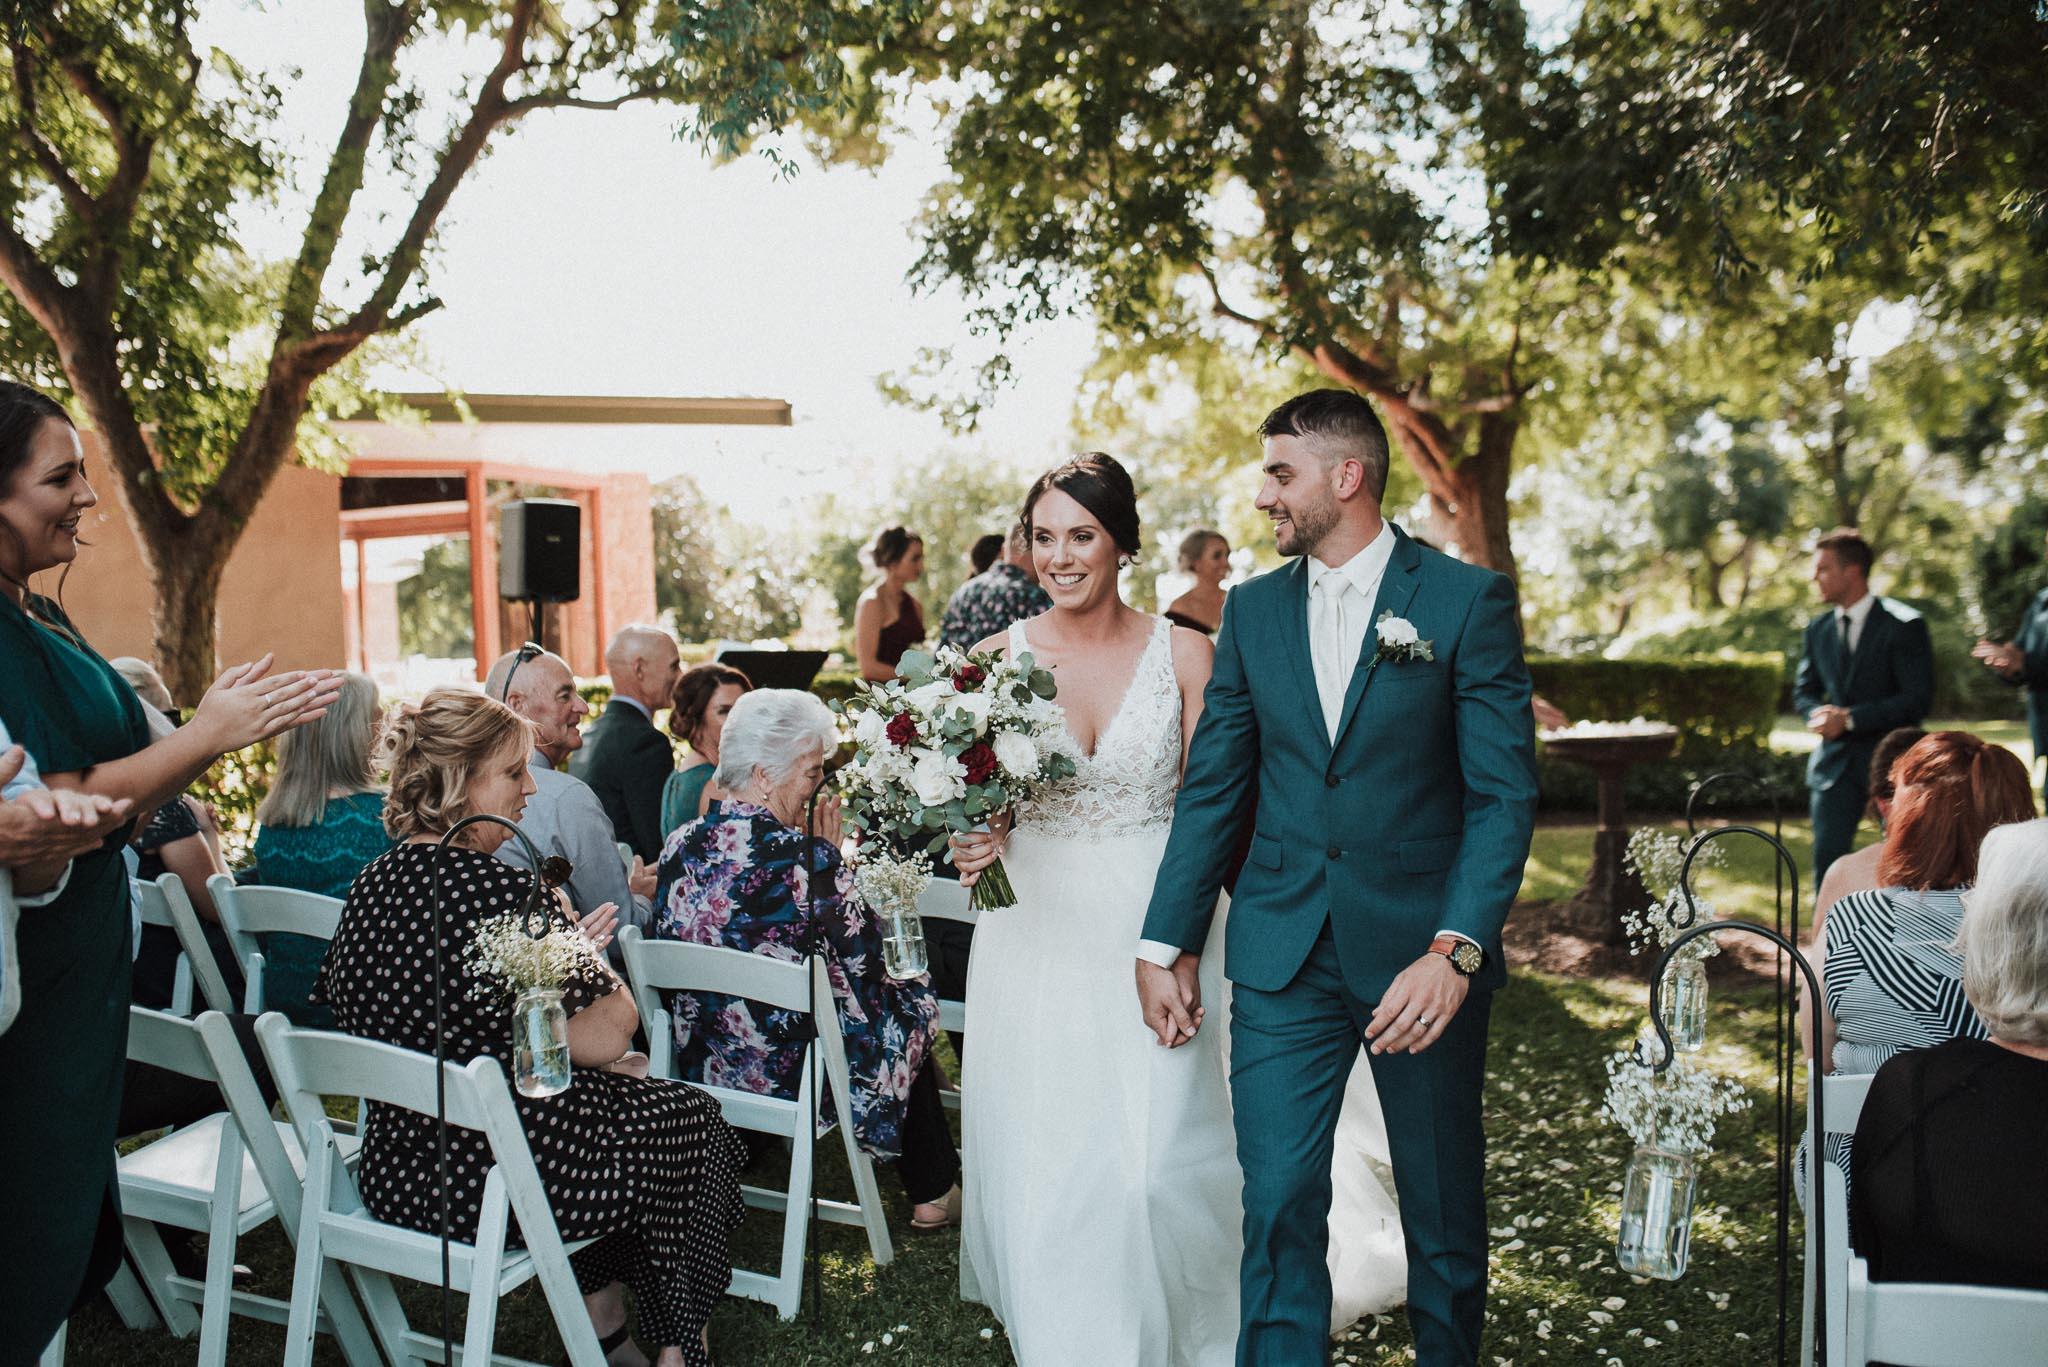 MECURE-RESORT-WEDDING-KING-WEB-103.jpg